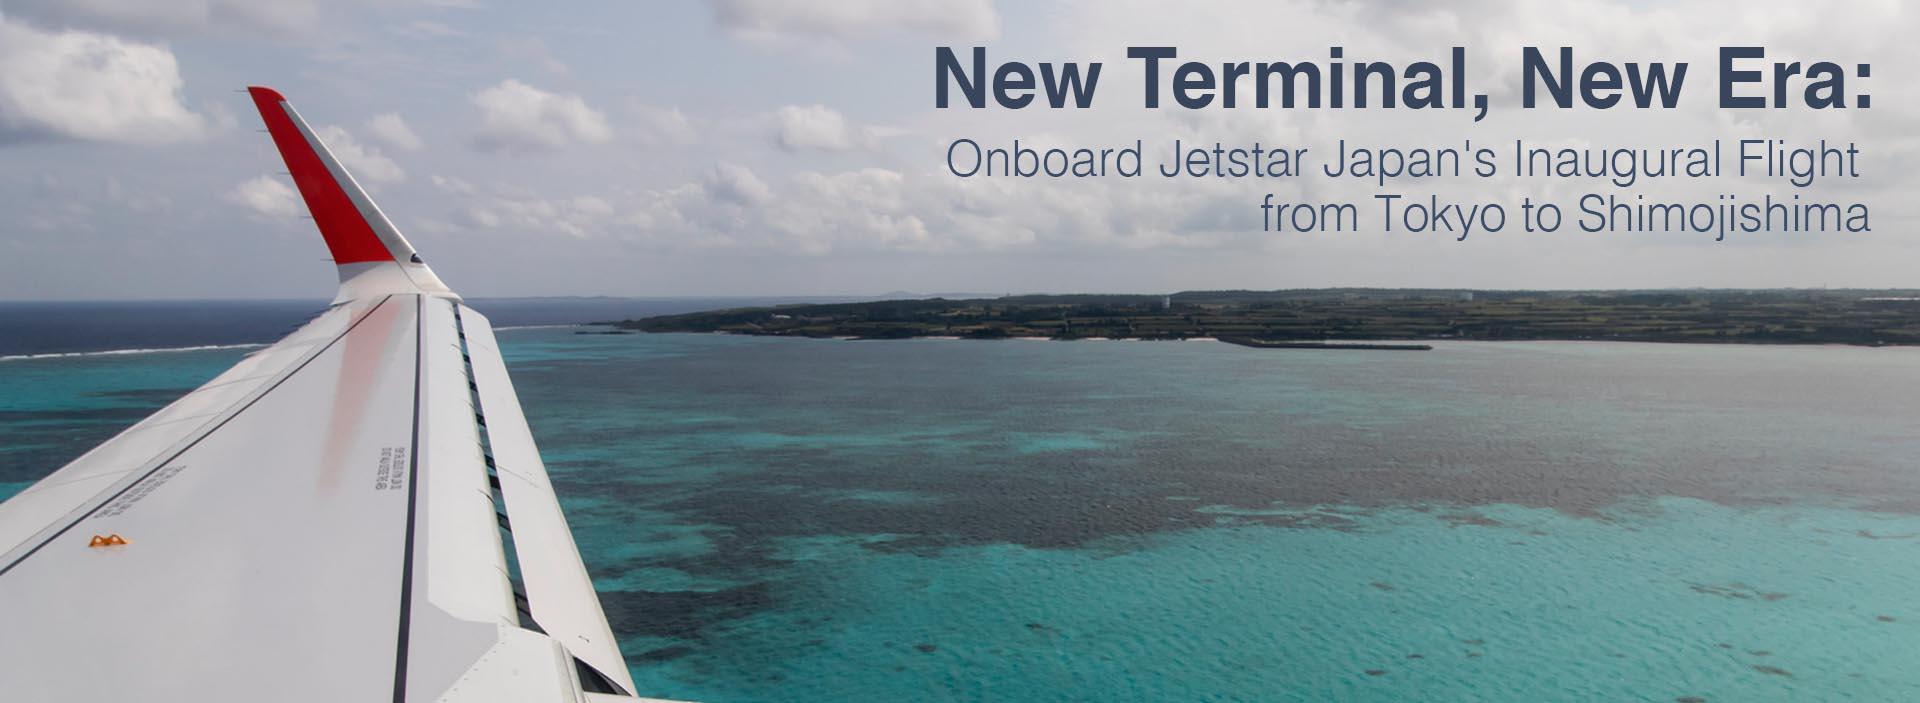 New Terminal, New Era: Onboard Jetstar Japan's Inaugural Flight from Tokyo to Shimojishima